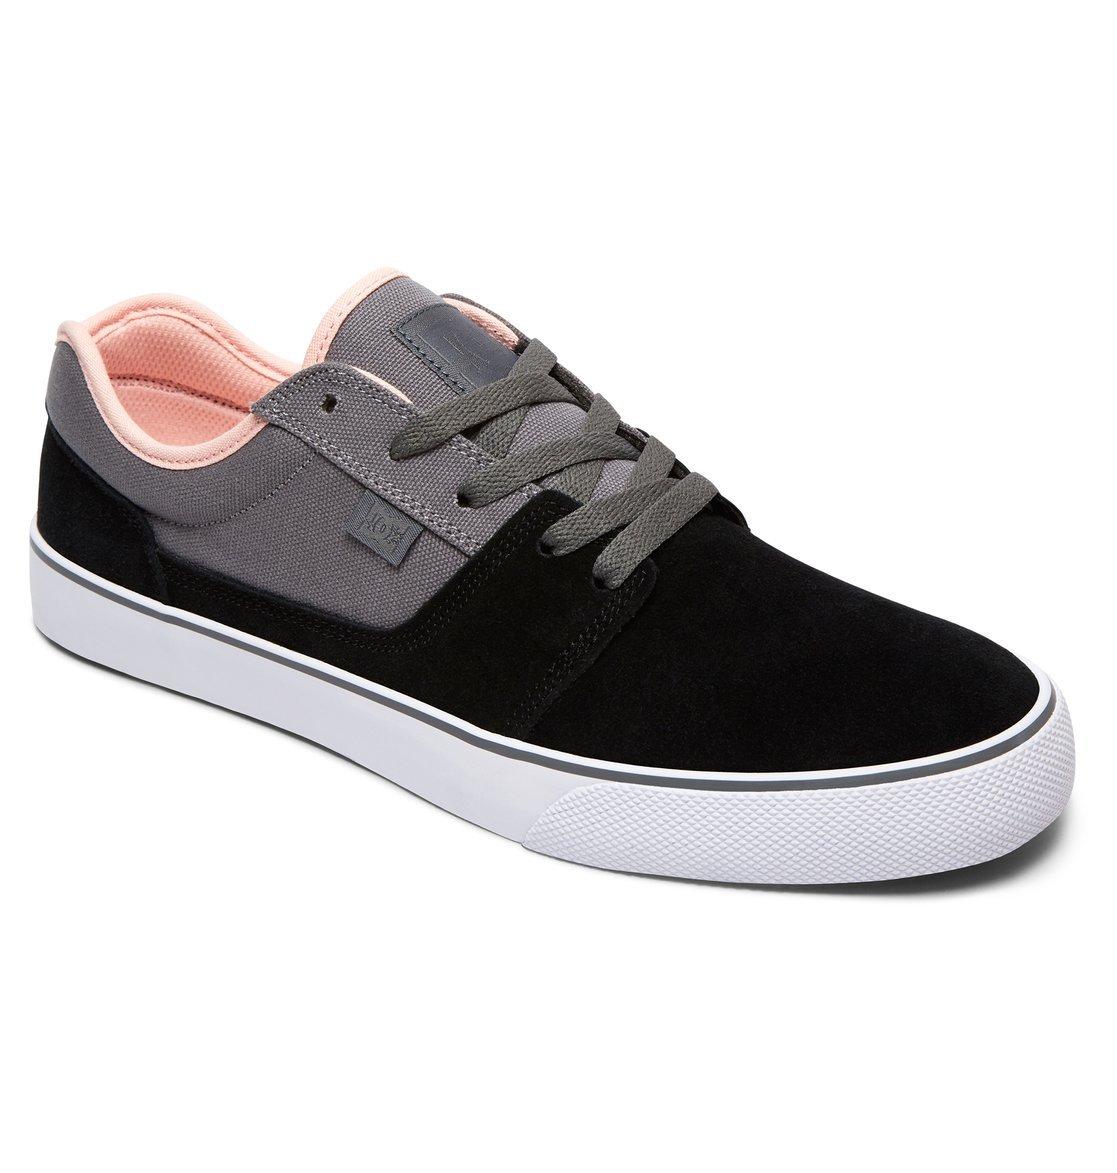 DC TONIK Unisex-Erwachsene Unisex-Erwachsene Unisex-Erwachsene Sneakers Grey/Pink 7007c9